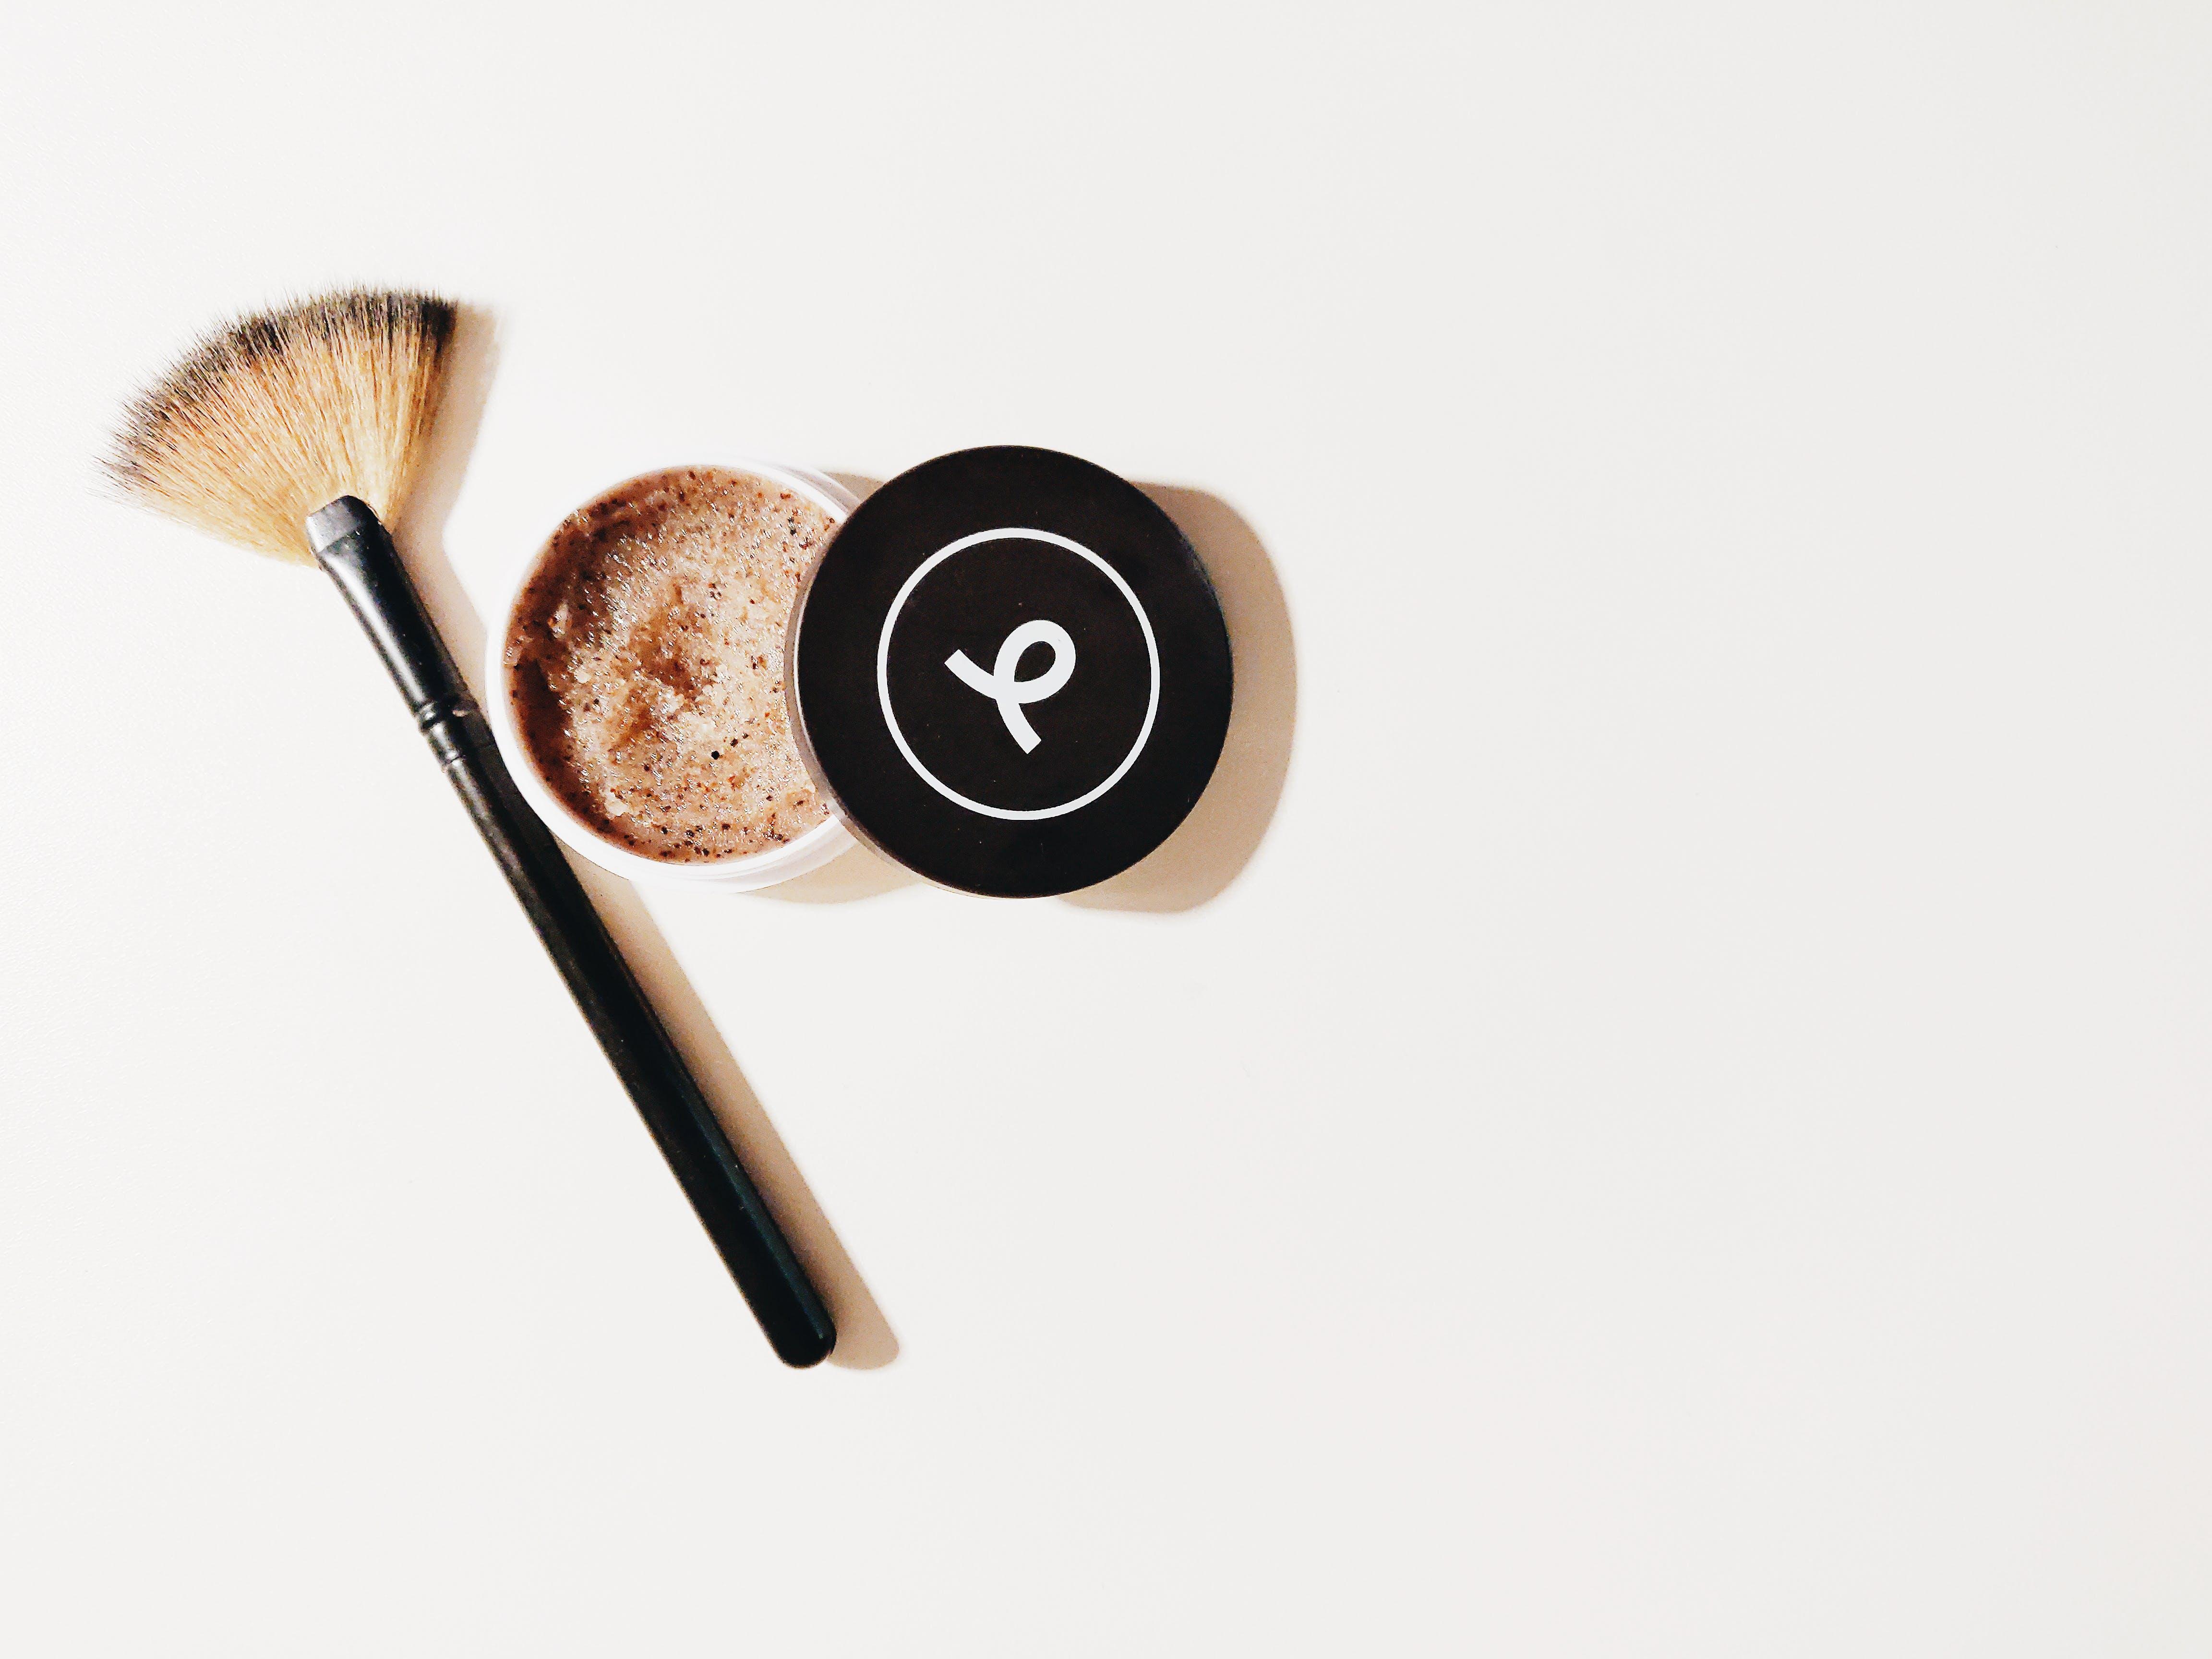 Brown And Black Make-up Brush